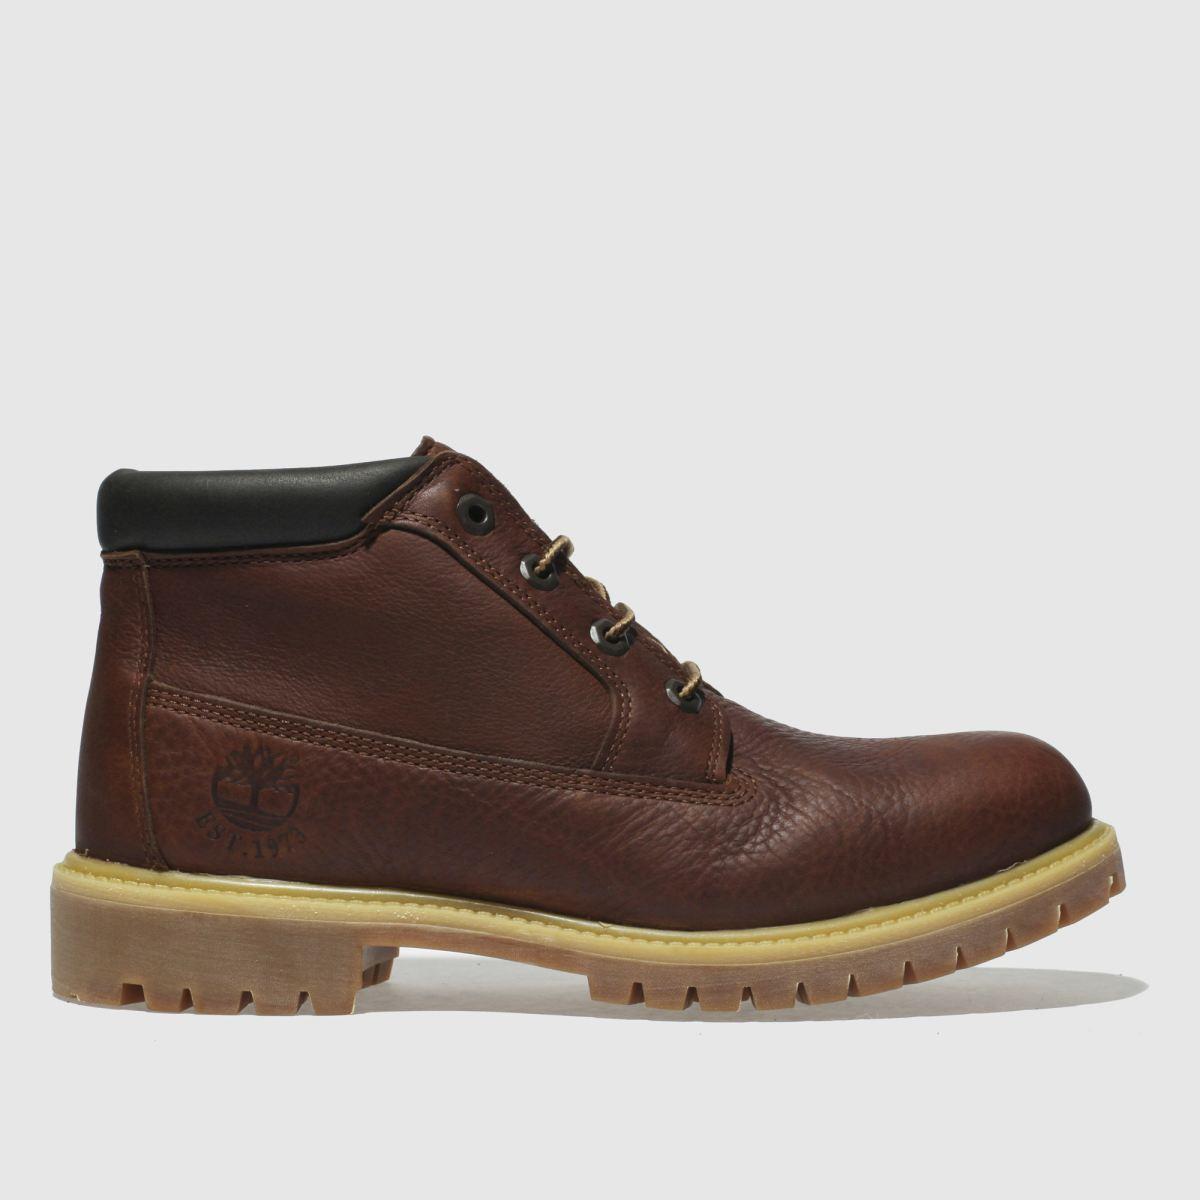 Timberland Brown Premium Chukka Ltd Boots